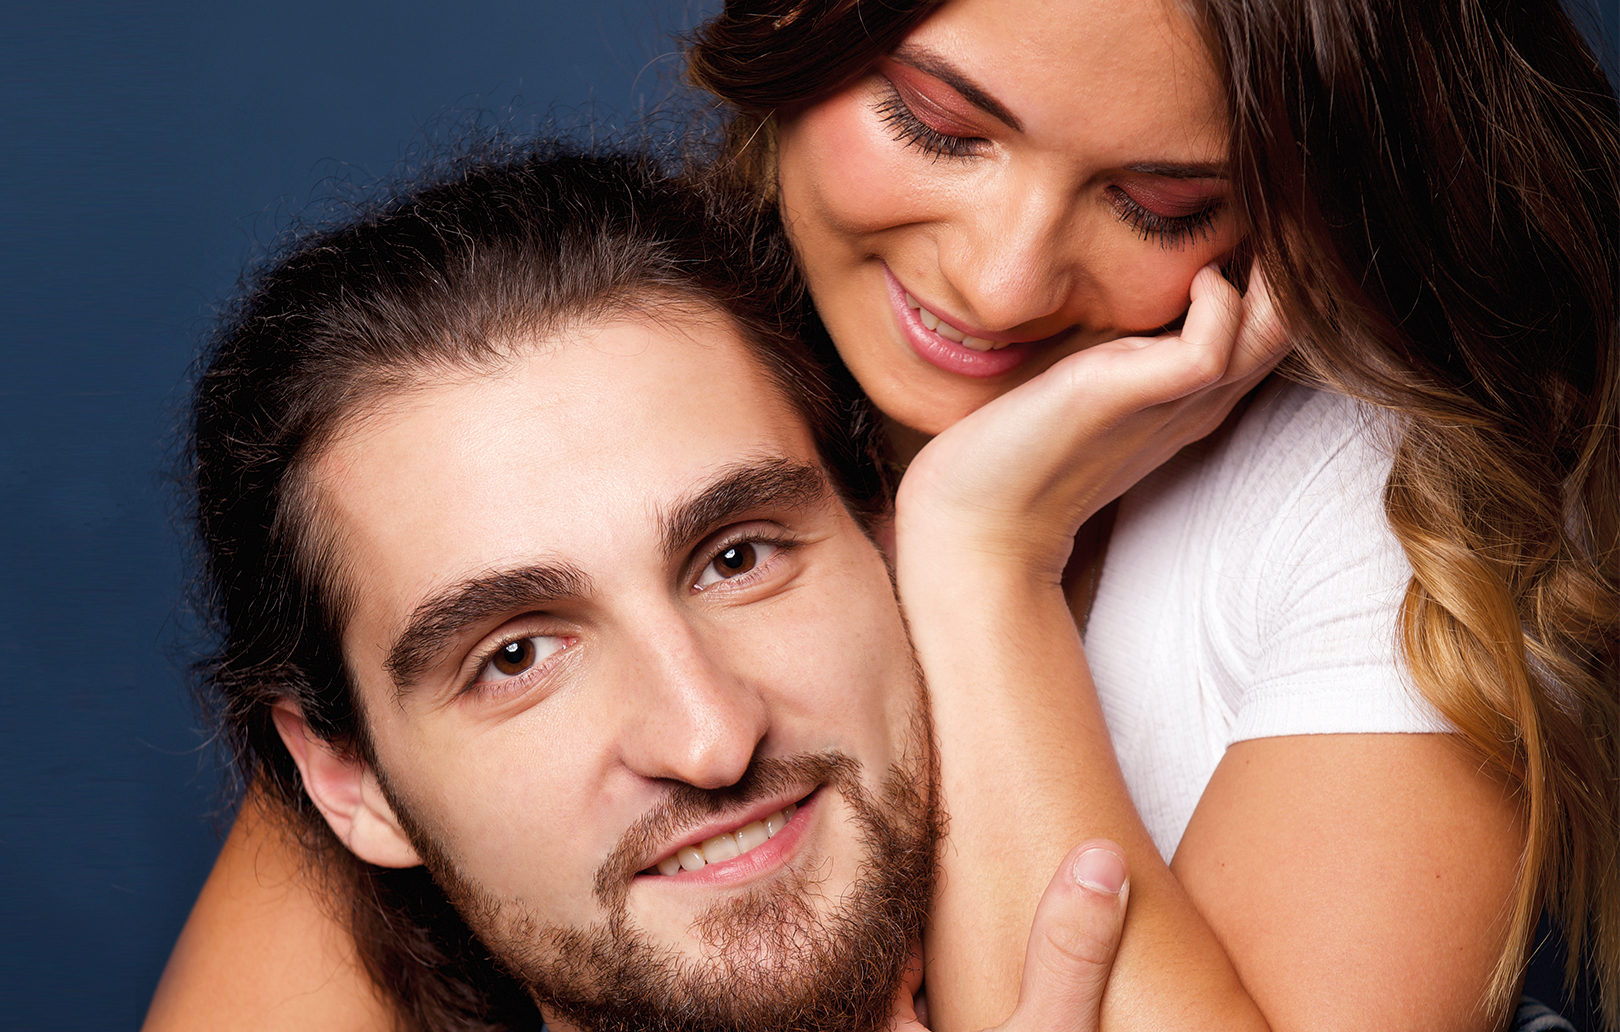 partner-fotoshooting-hagen-bg21618472149